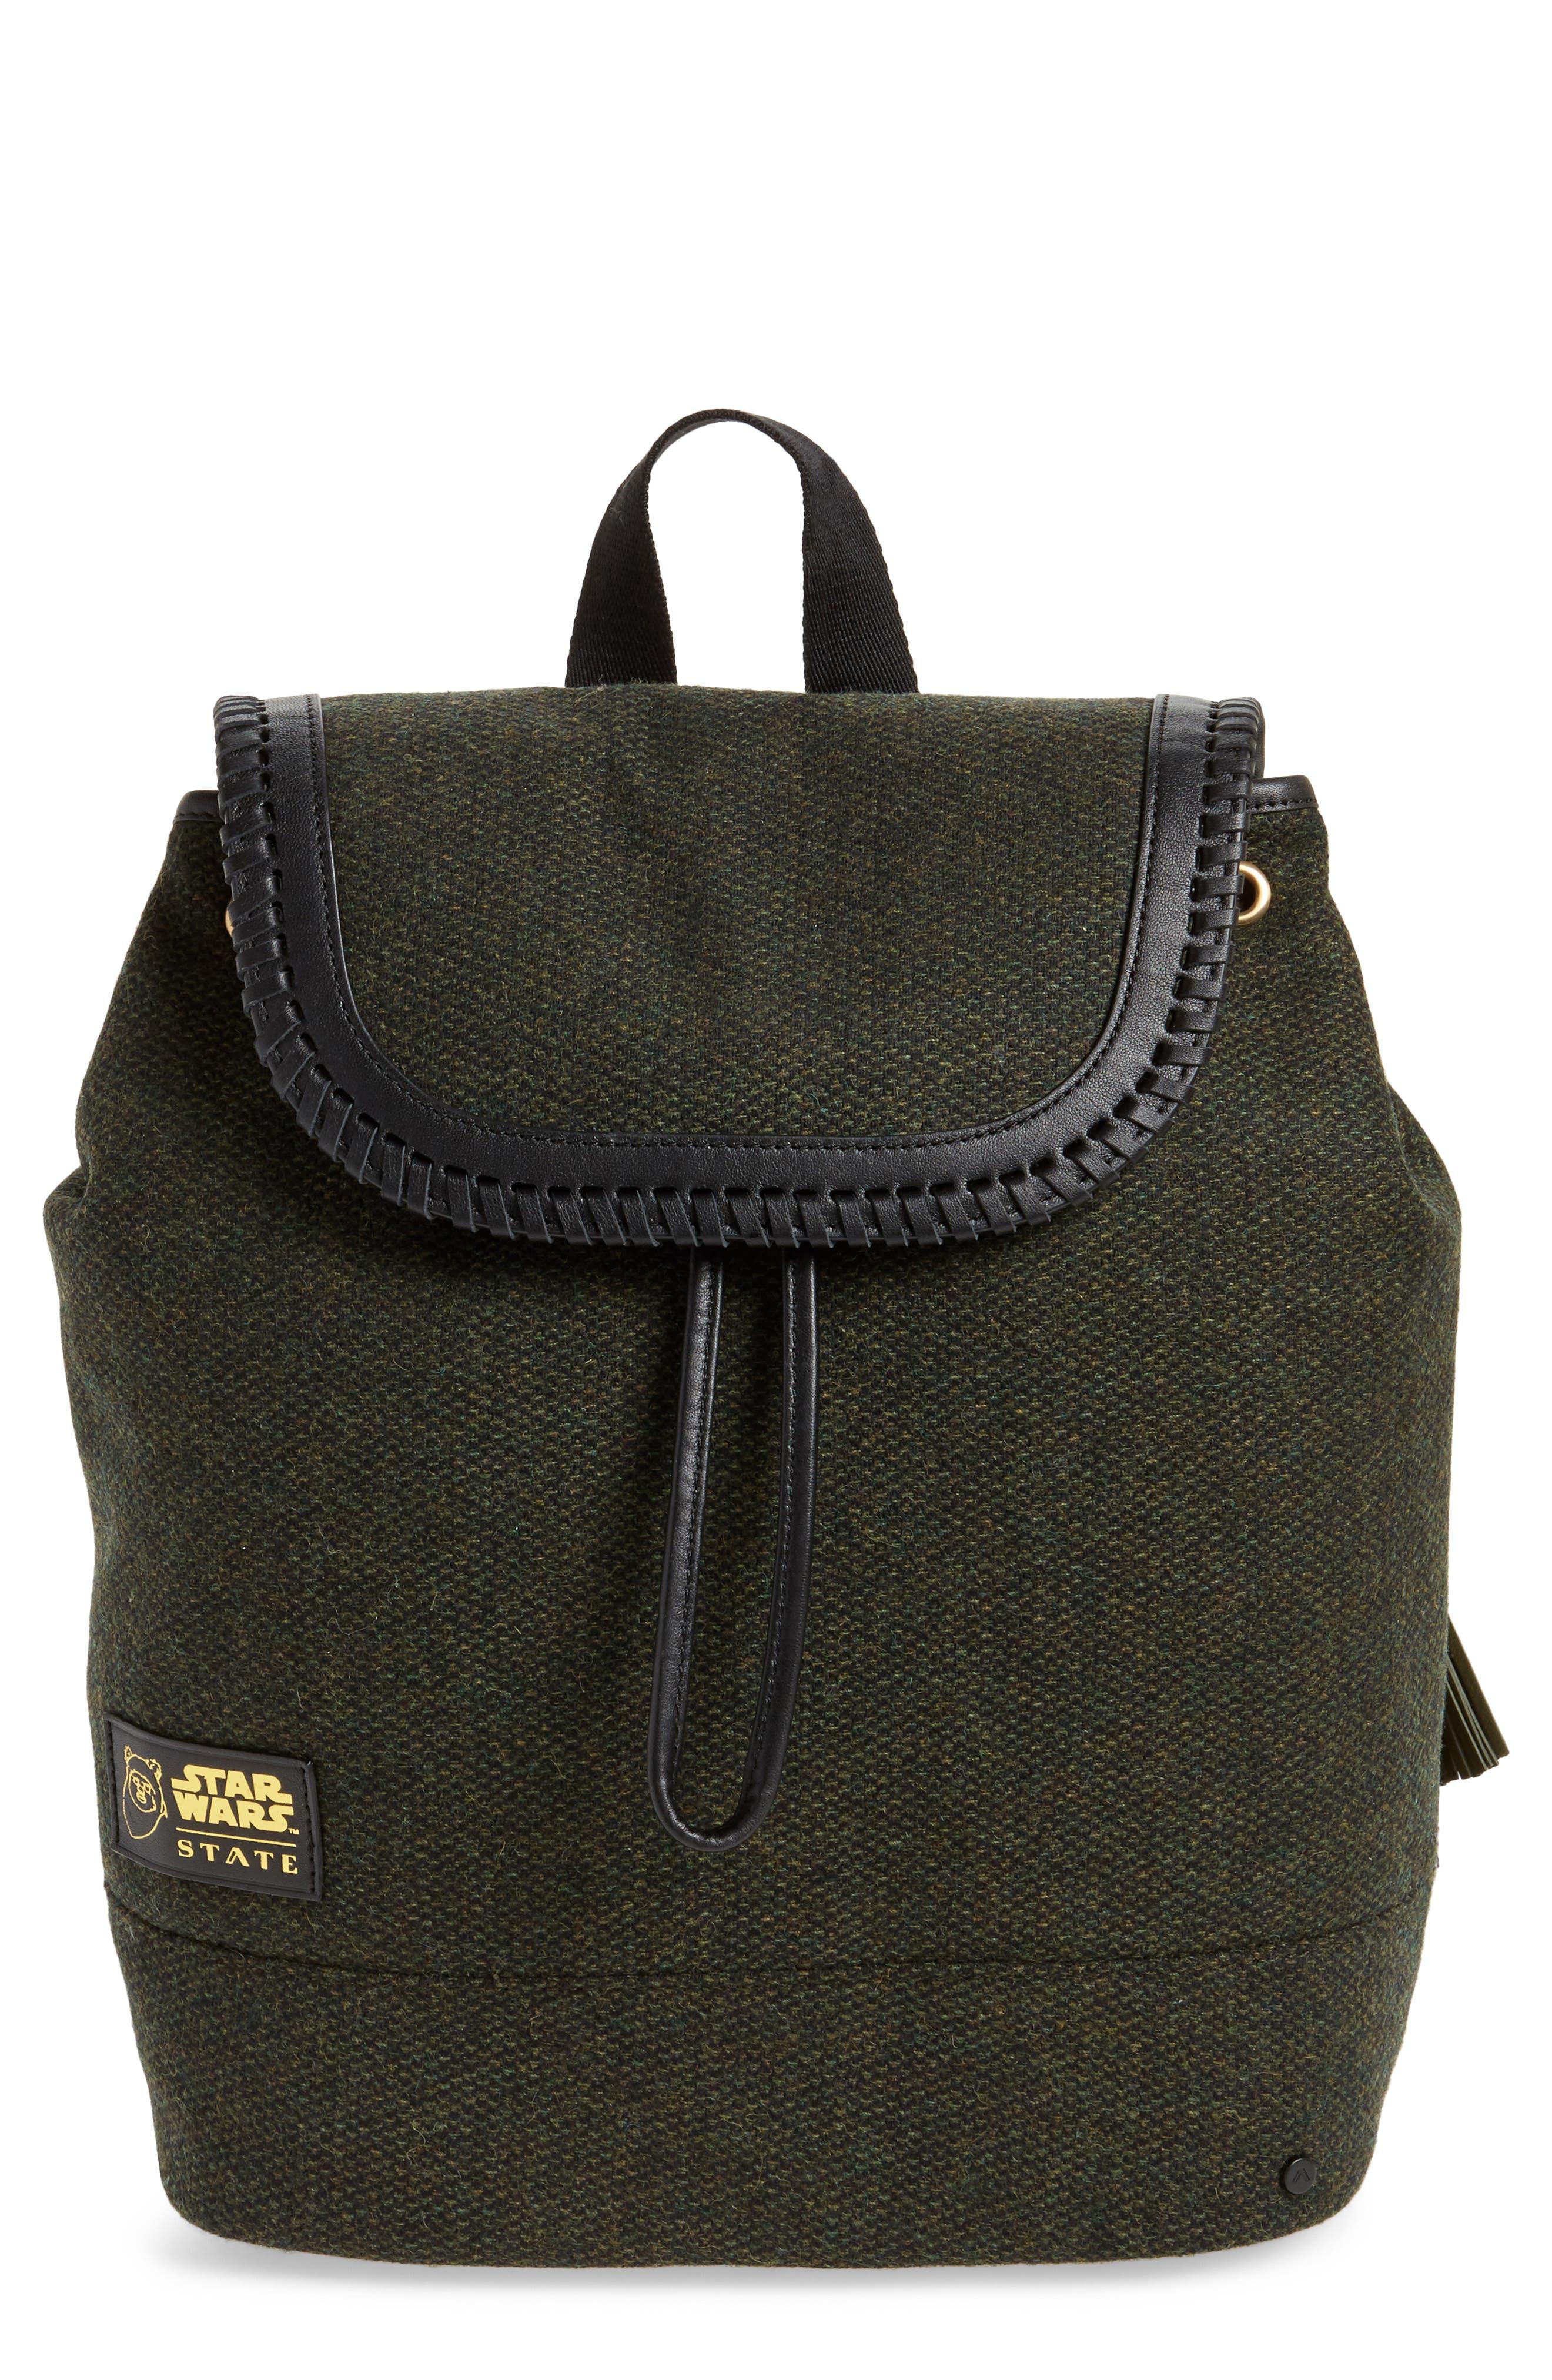 STATE Bags Star Wars - The Ewoks Hattie Backpack